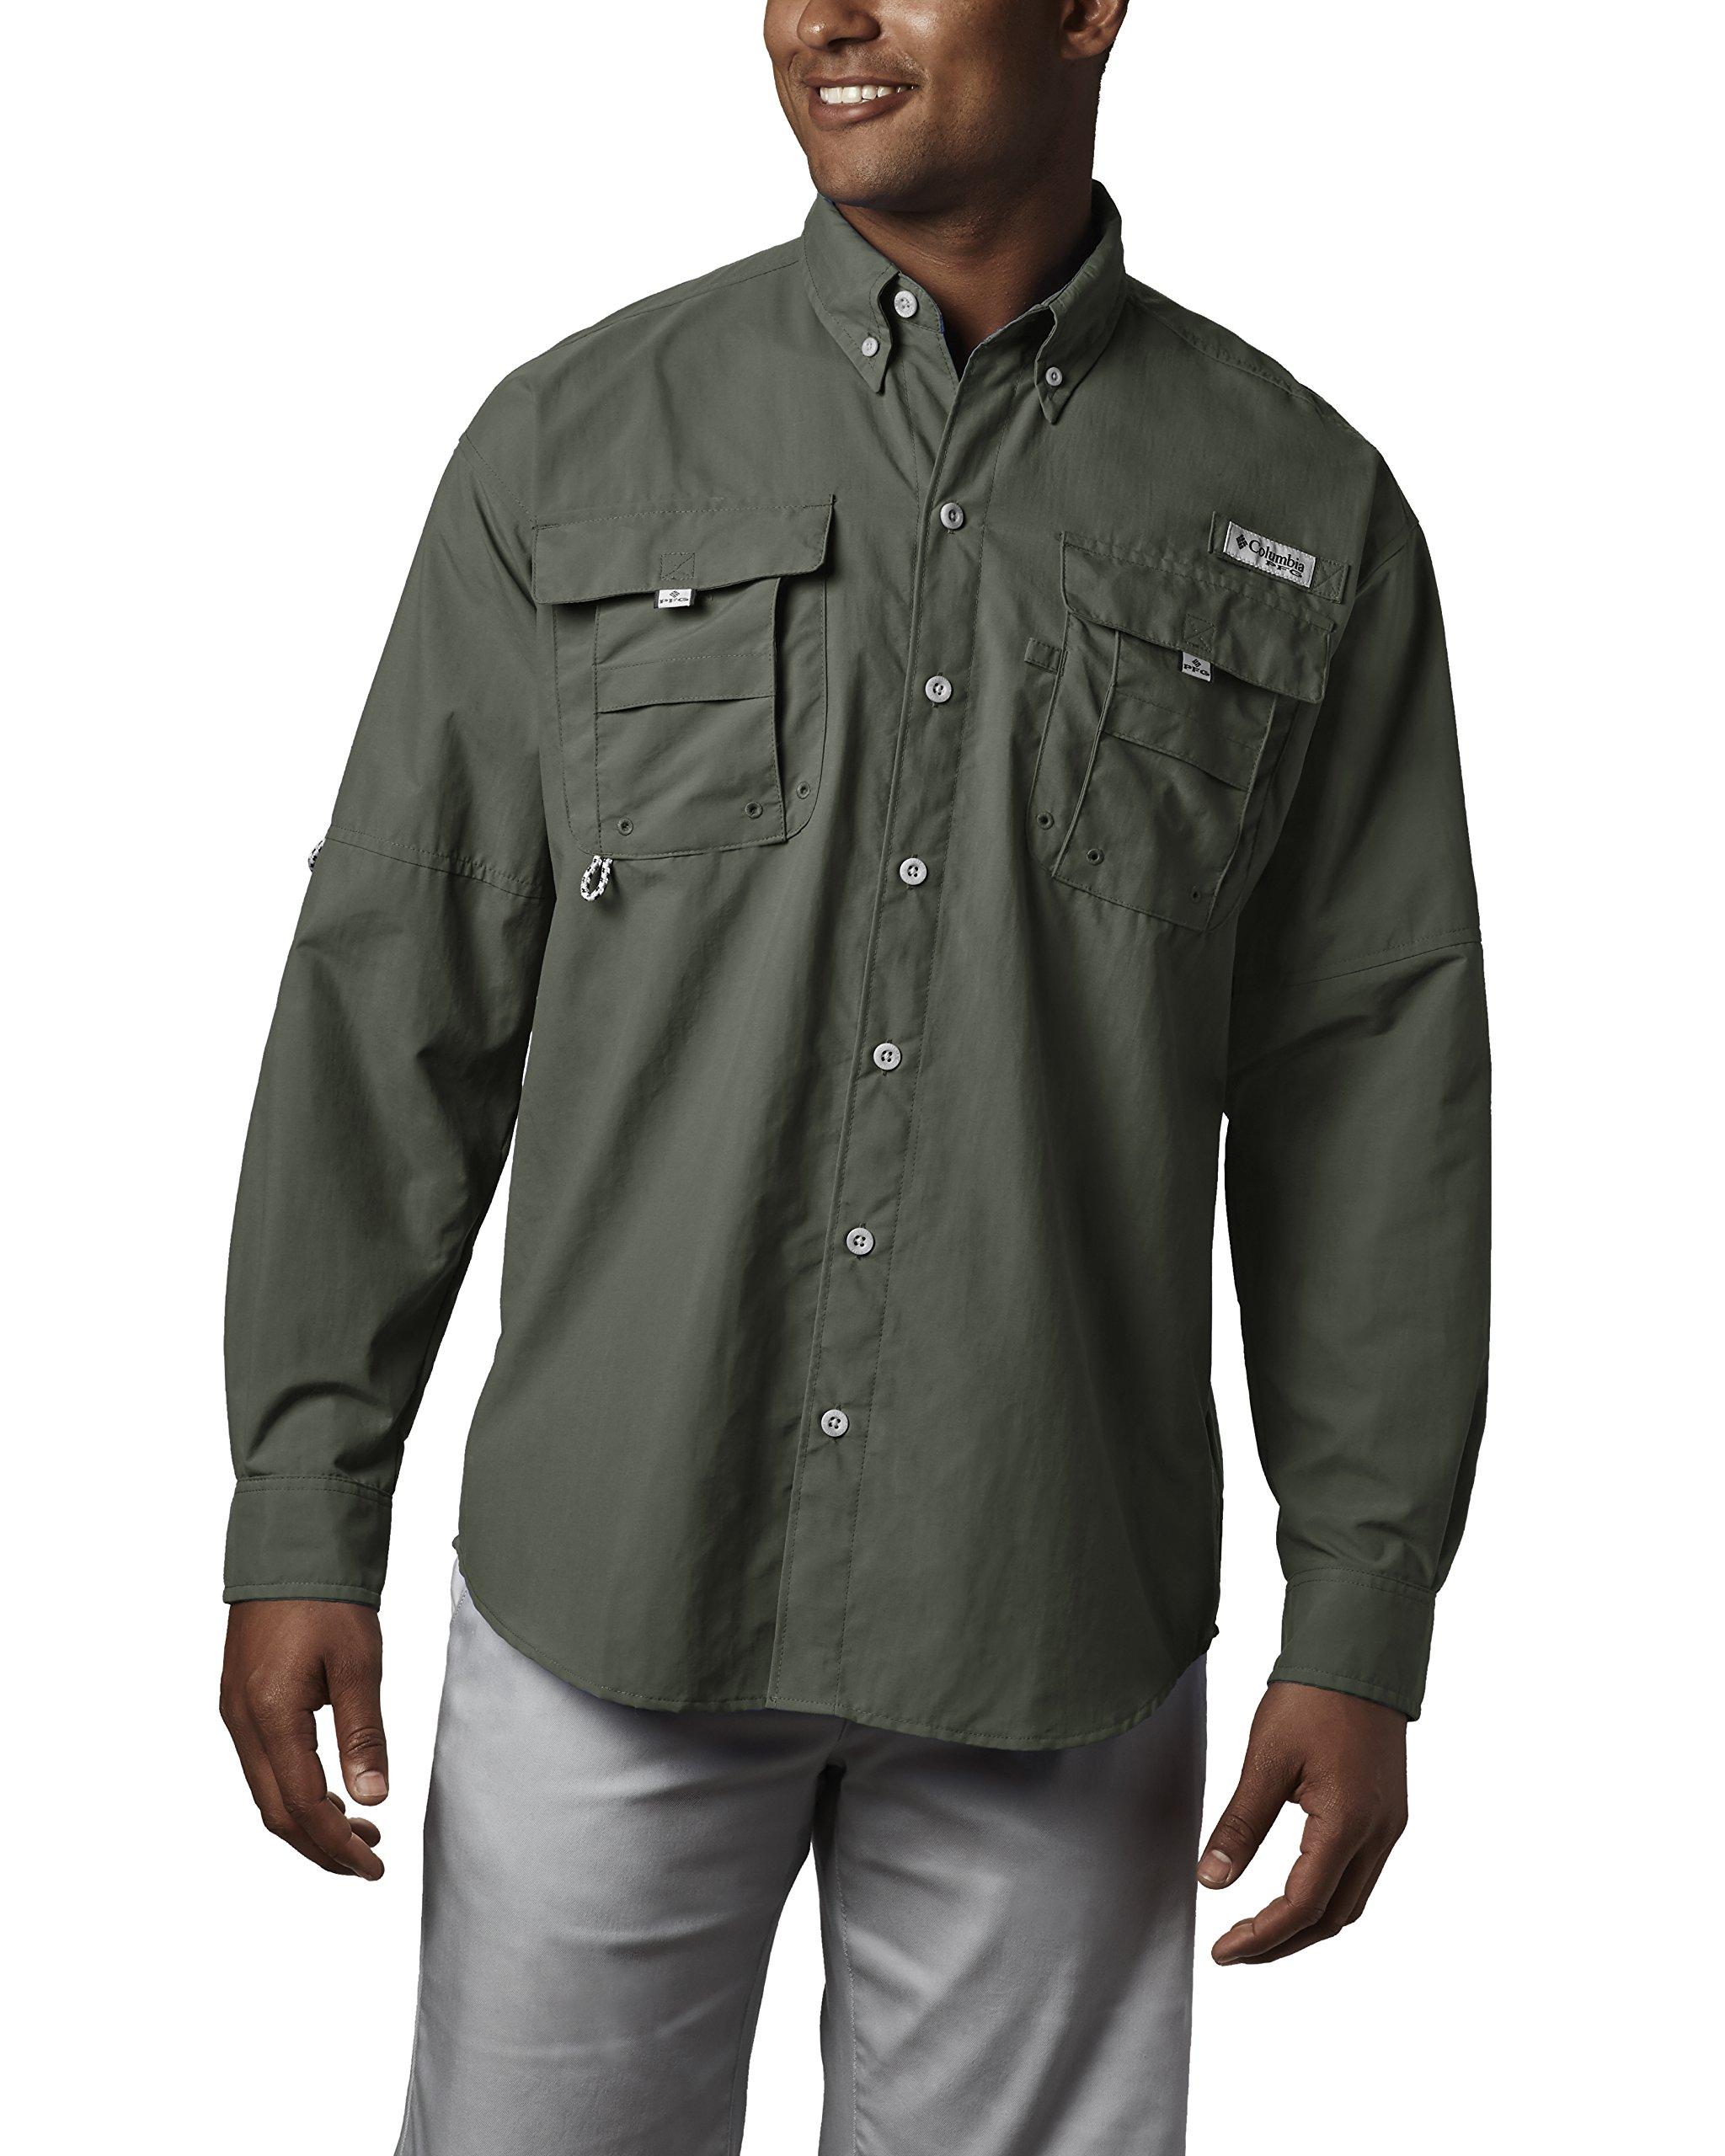 Columbia Men's Bahama II Long Sleeve Shirt, Cypress, Large